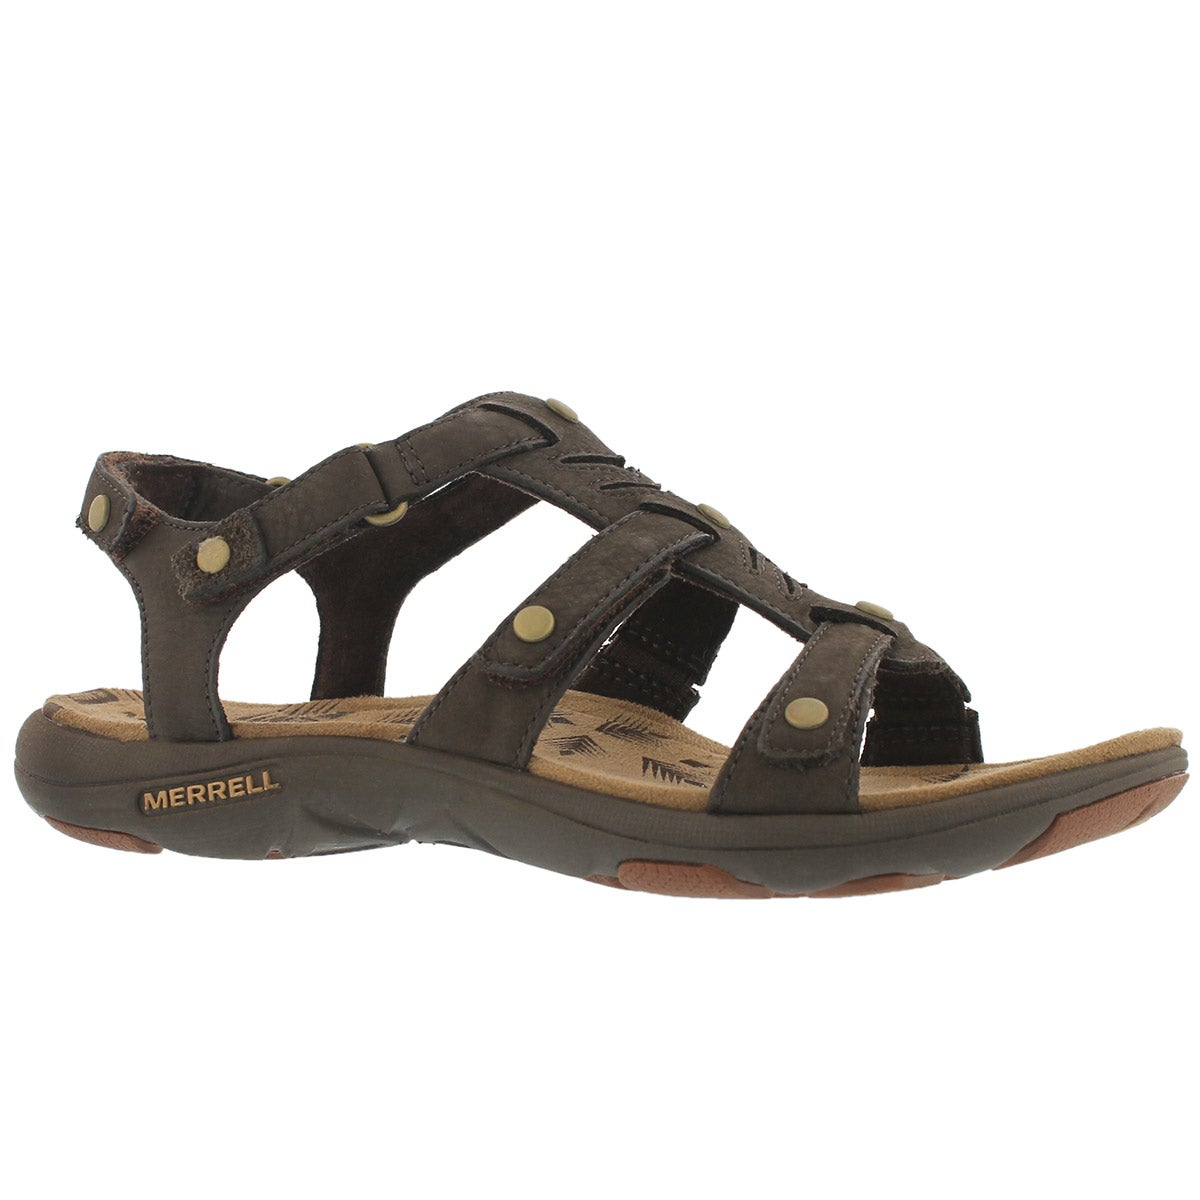 Women's ADHERA THREE STRAP brown casual sandals